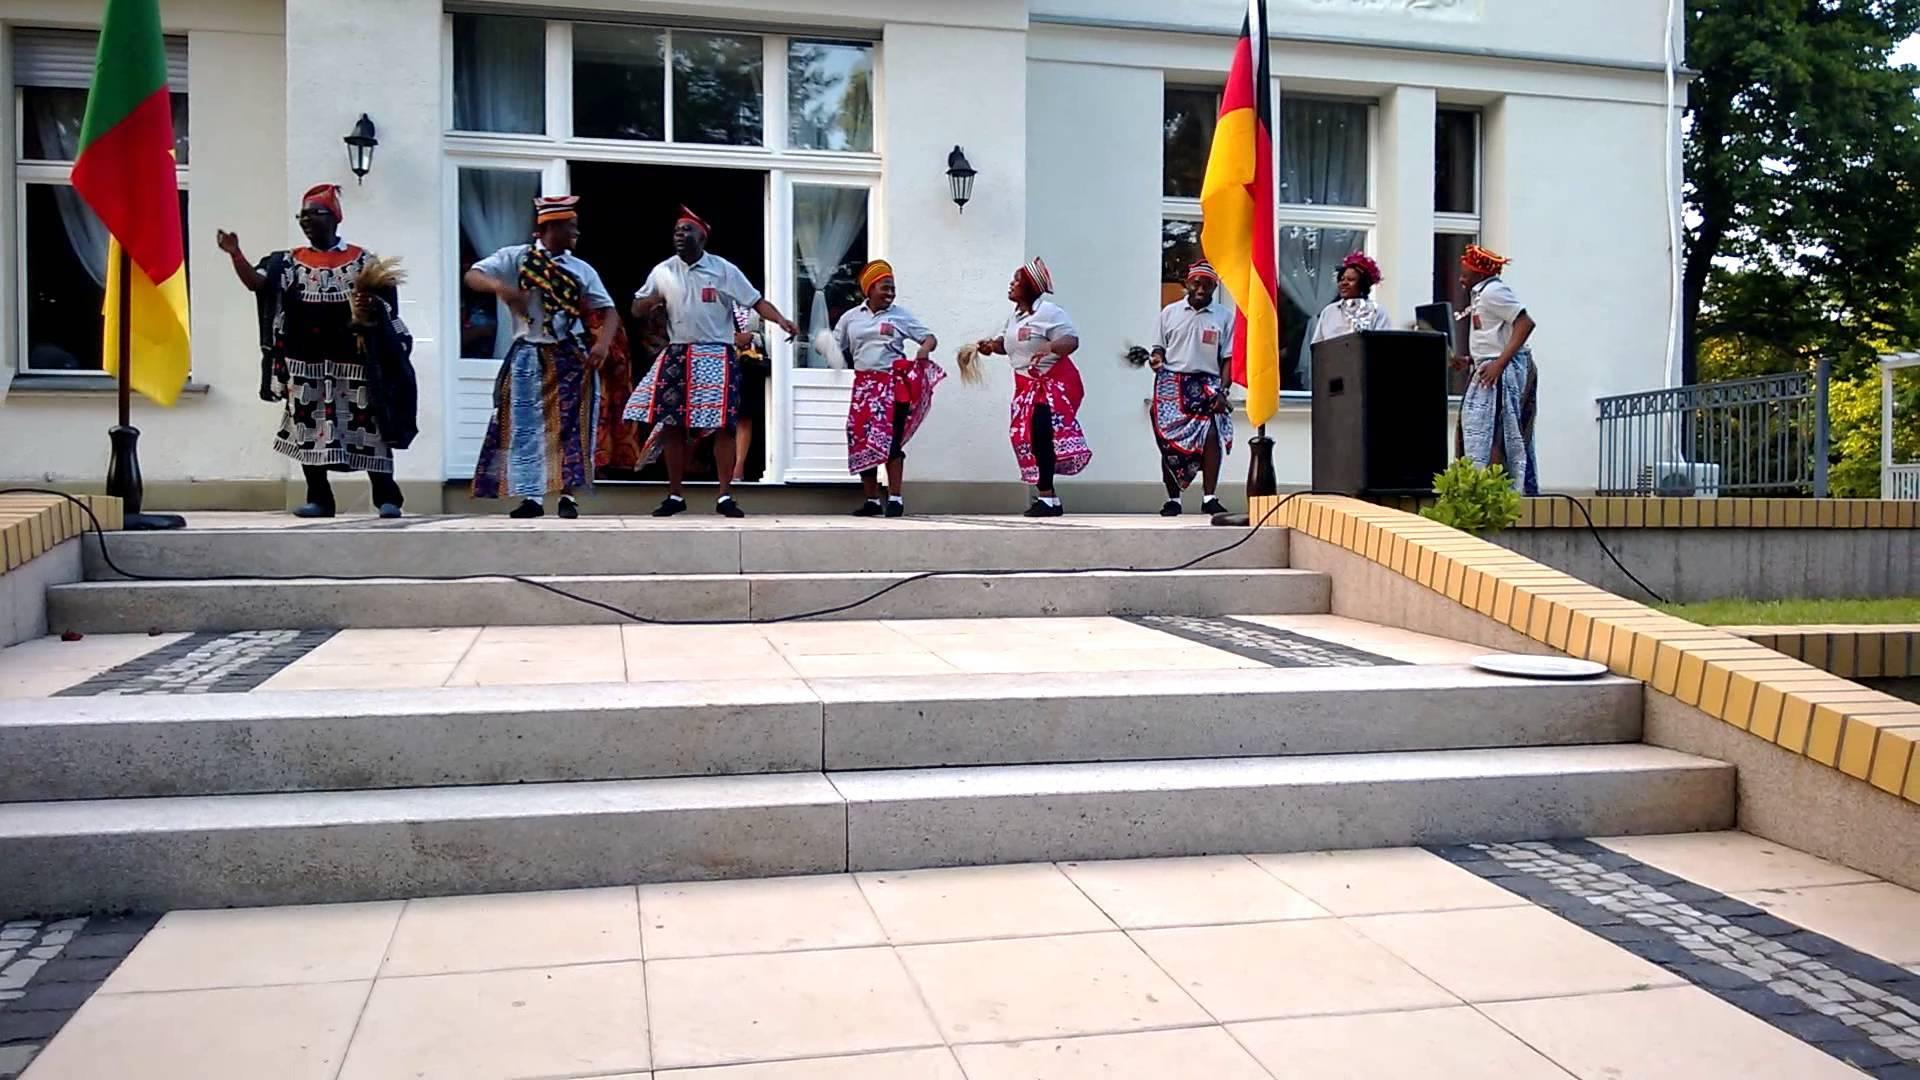 Cameroon Embassy, Victoria Island